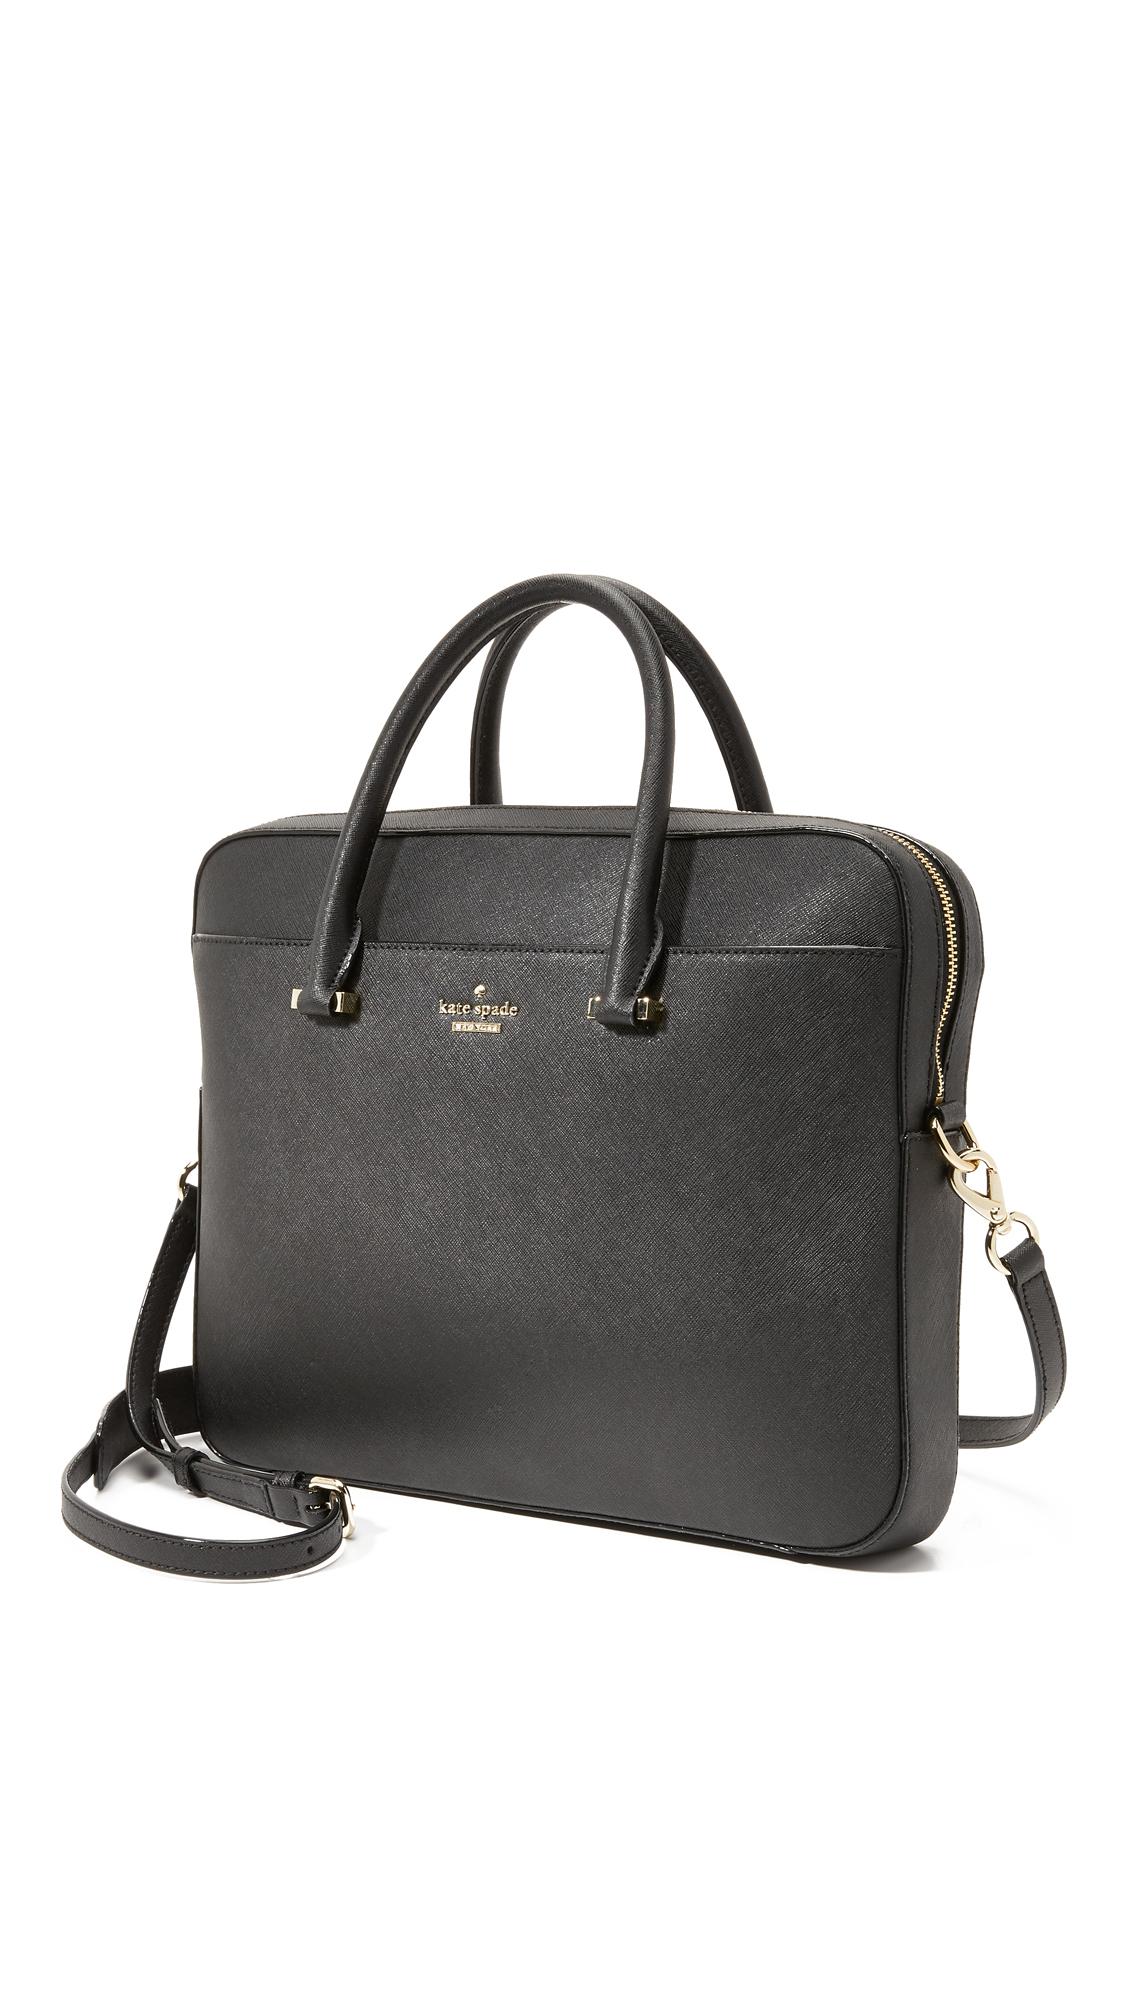 1093f5e408b2 Lyst - Kate Spade 13 Inch Saffiano Laptop Bag - Black in Black